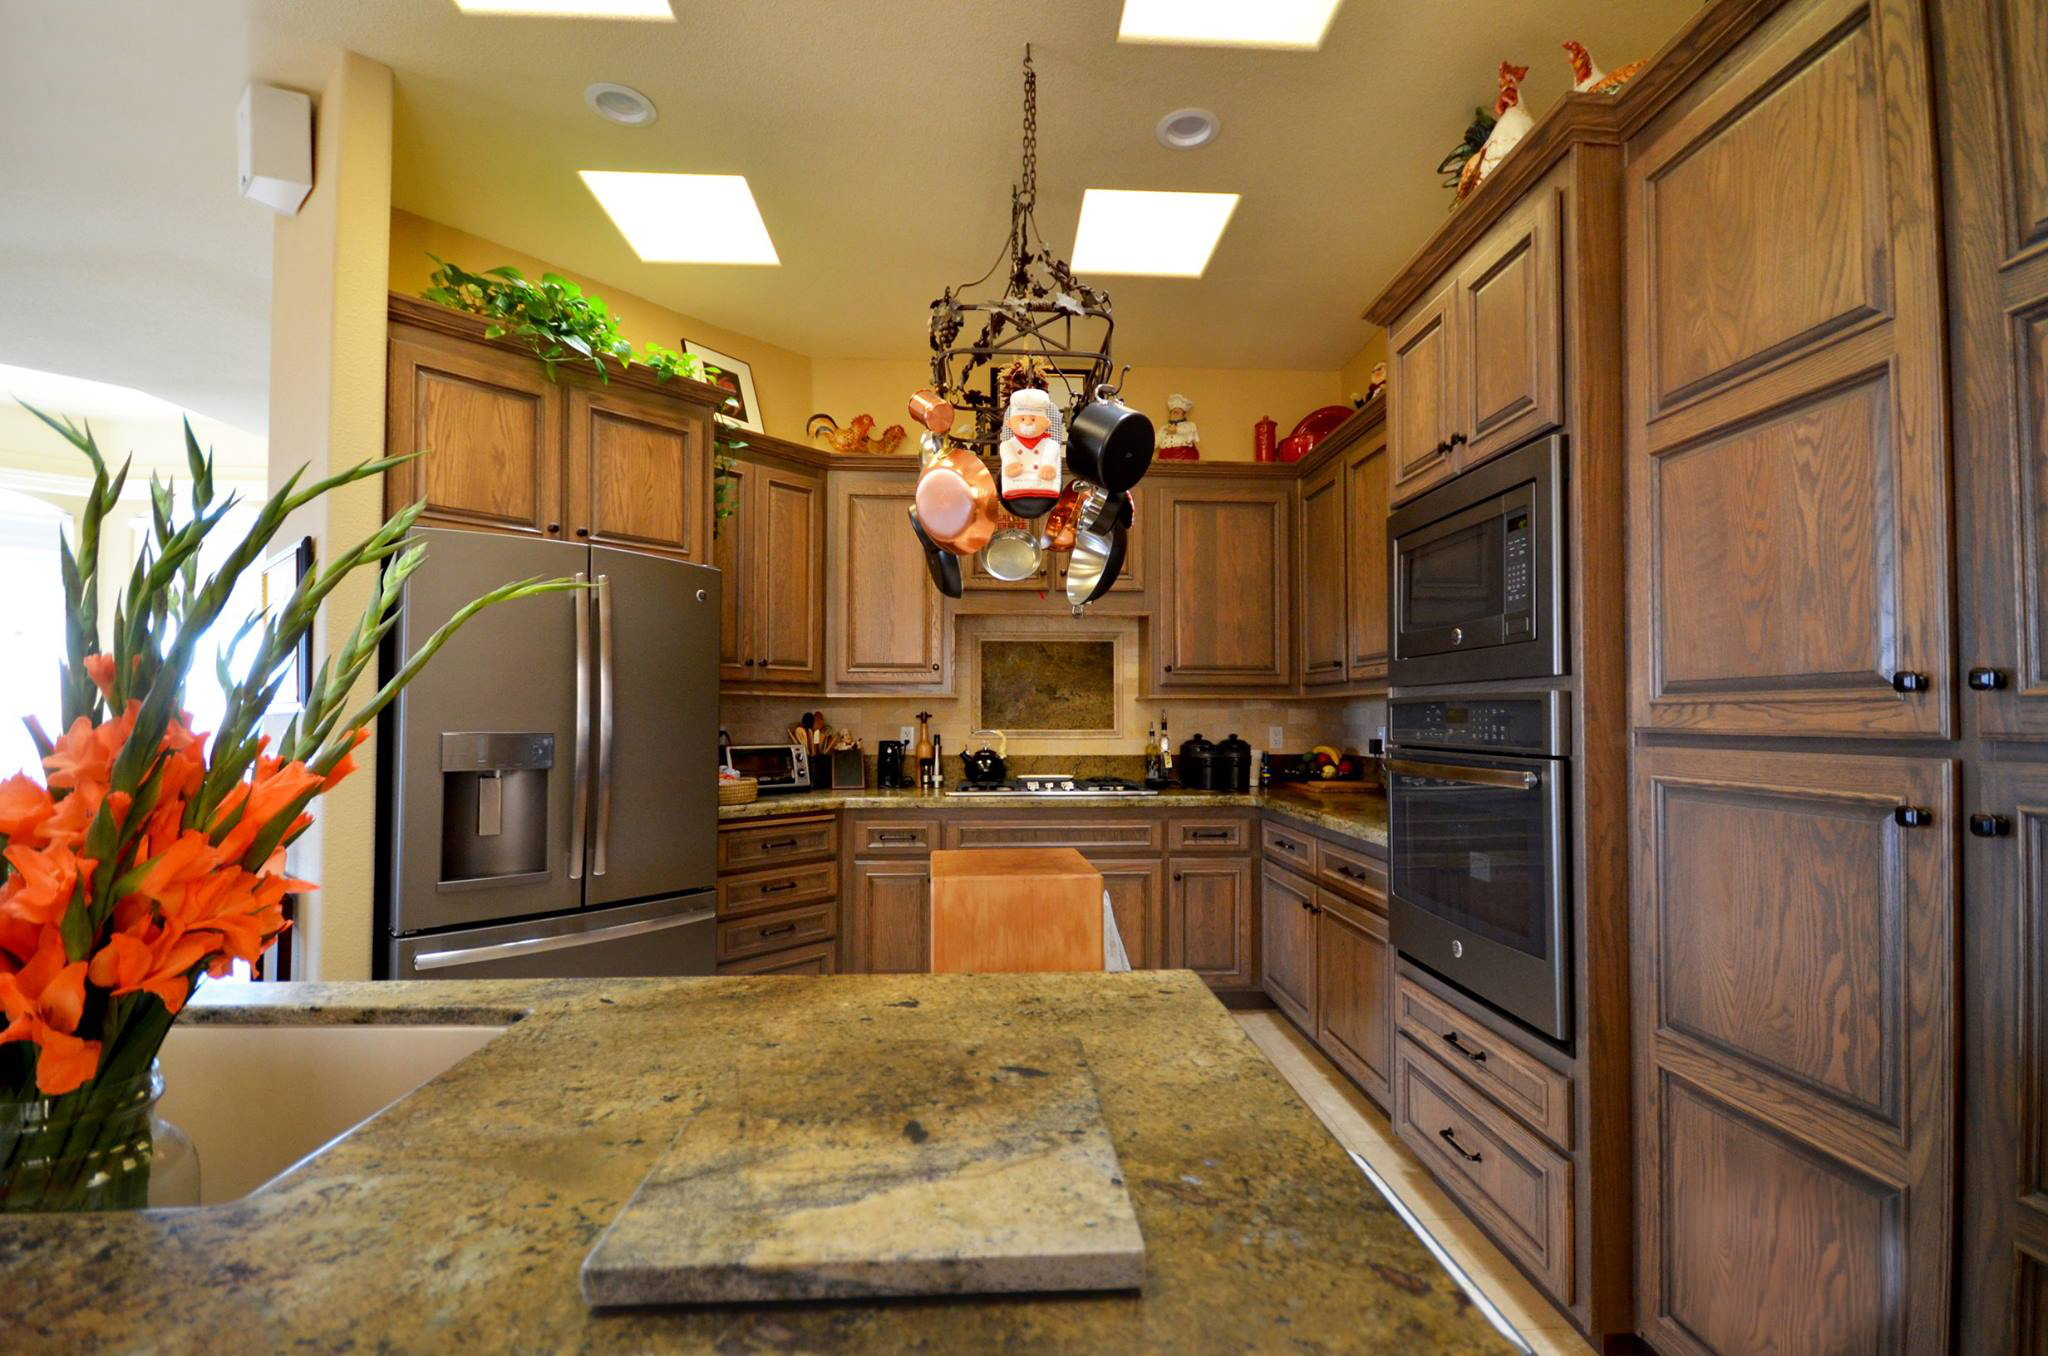 New Life Bath \u0026 Kitchen & Kitchen Cabinet Refacing | New Life Bath \u0026 Kitchen